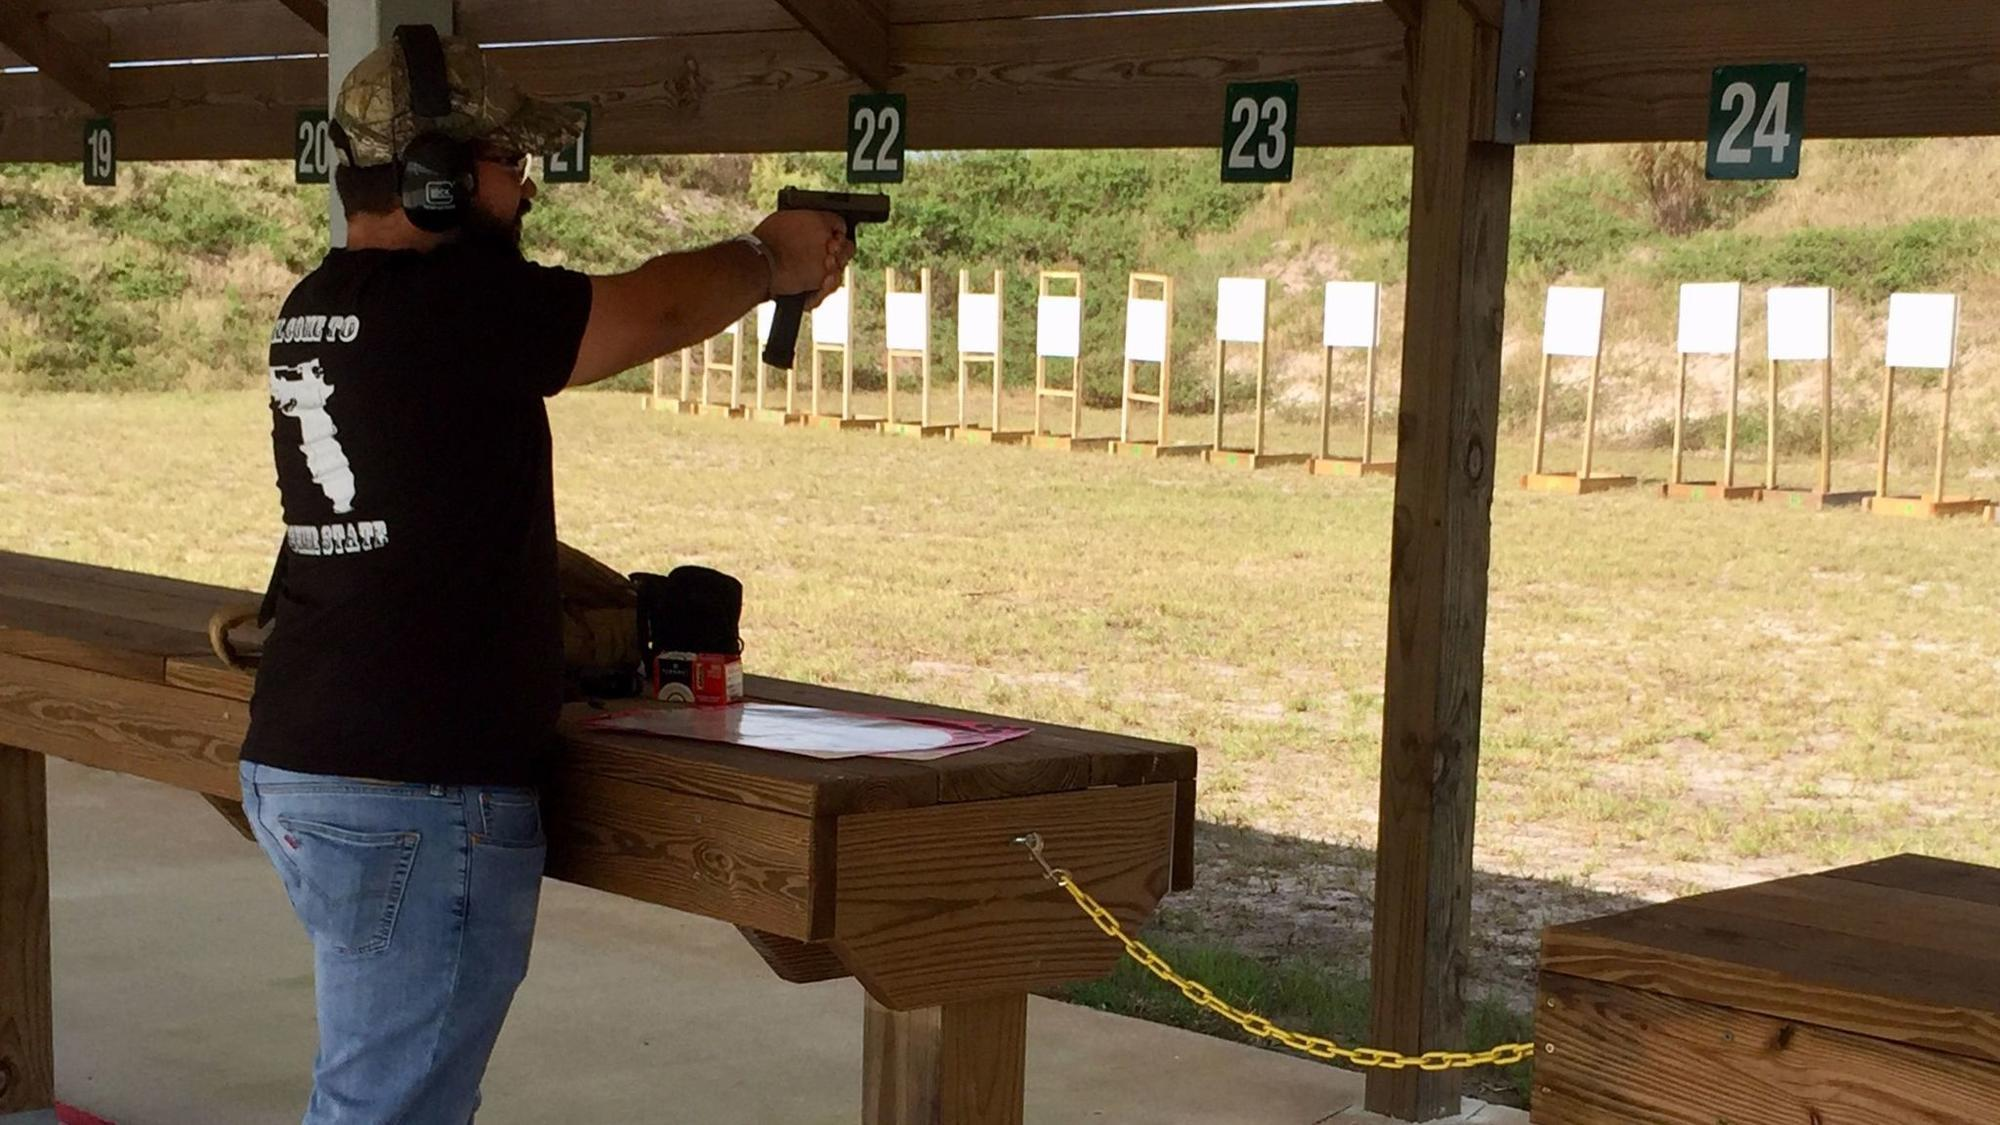 New Public Gun Range Opens In Rural Slice Of Osceola